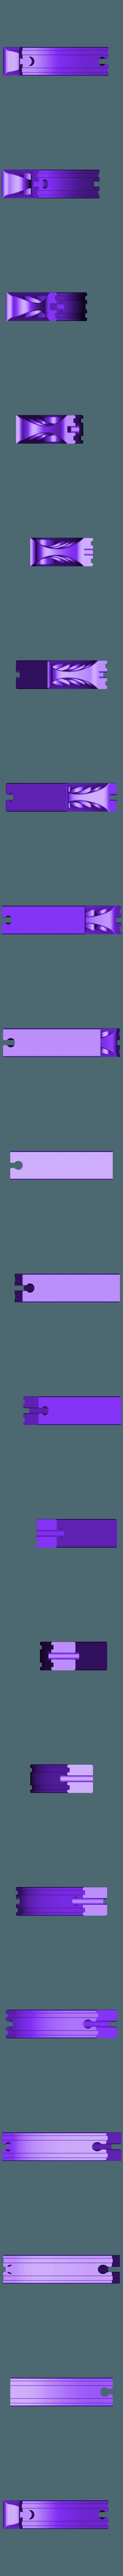 Downslope Start Track.stl Download free STL file Toy Train Tracks • 3D printer design, FerryTeacher